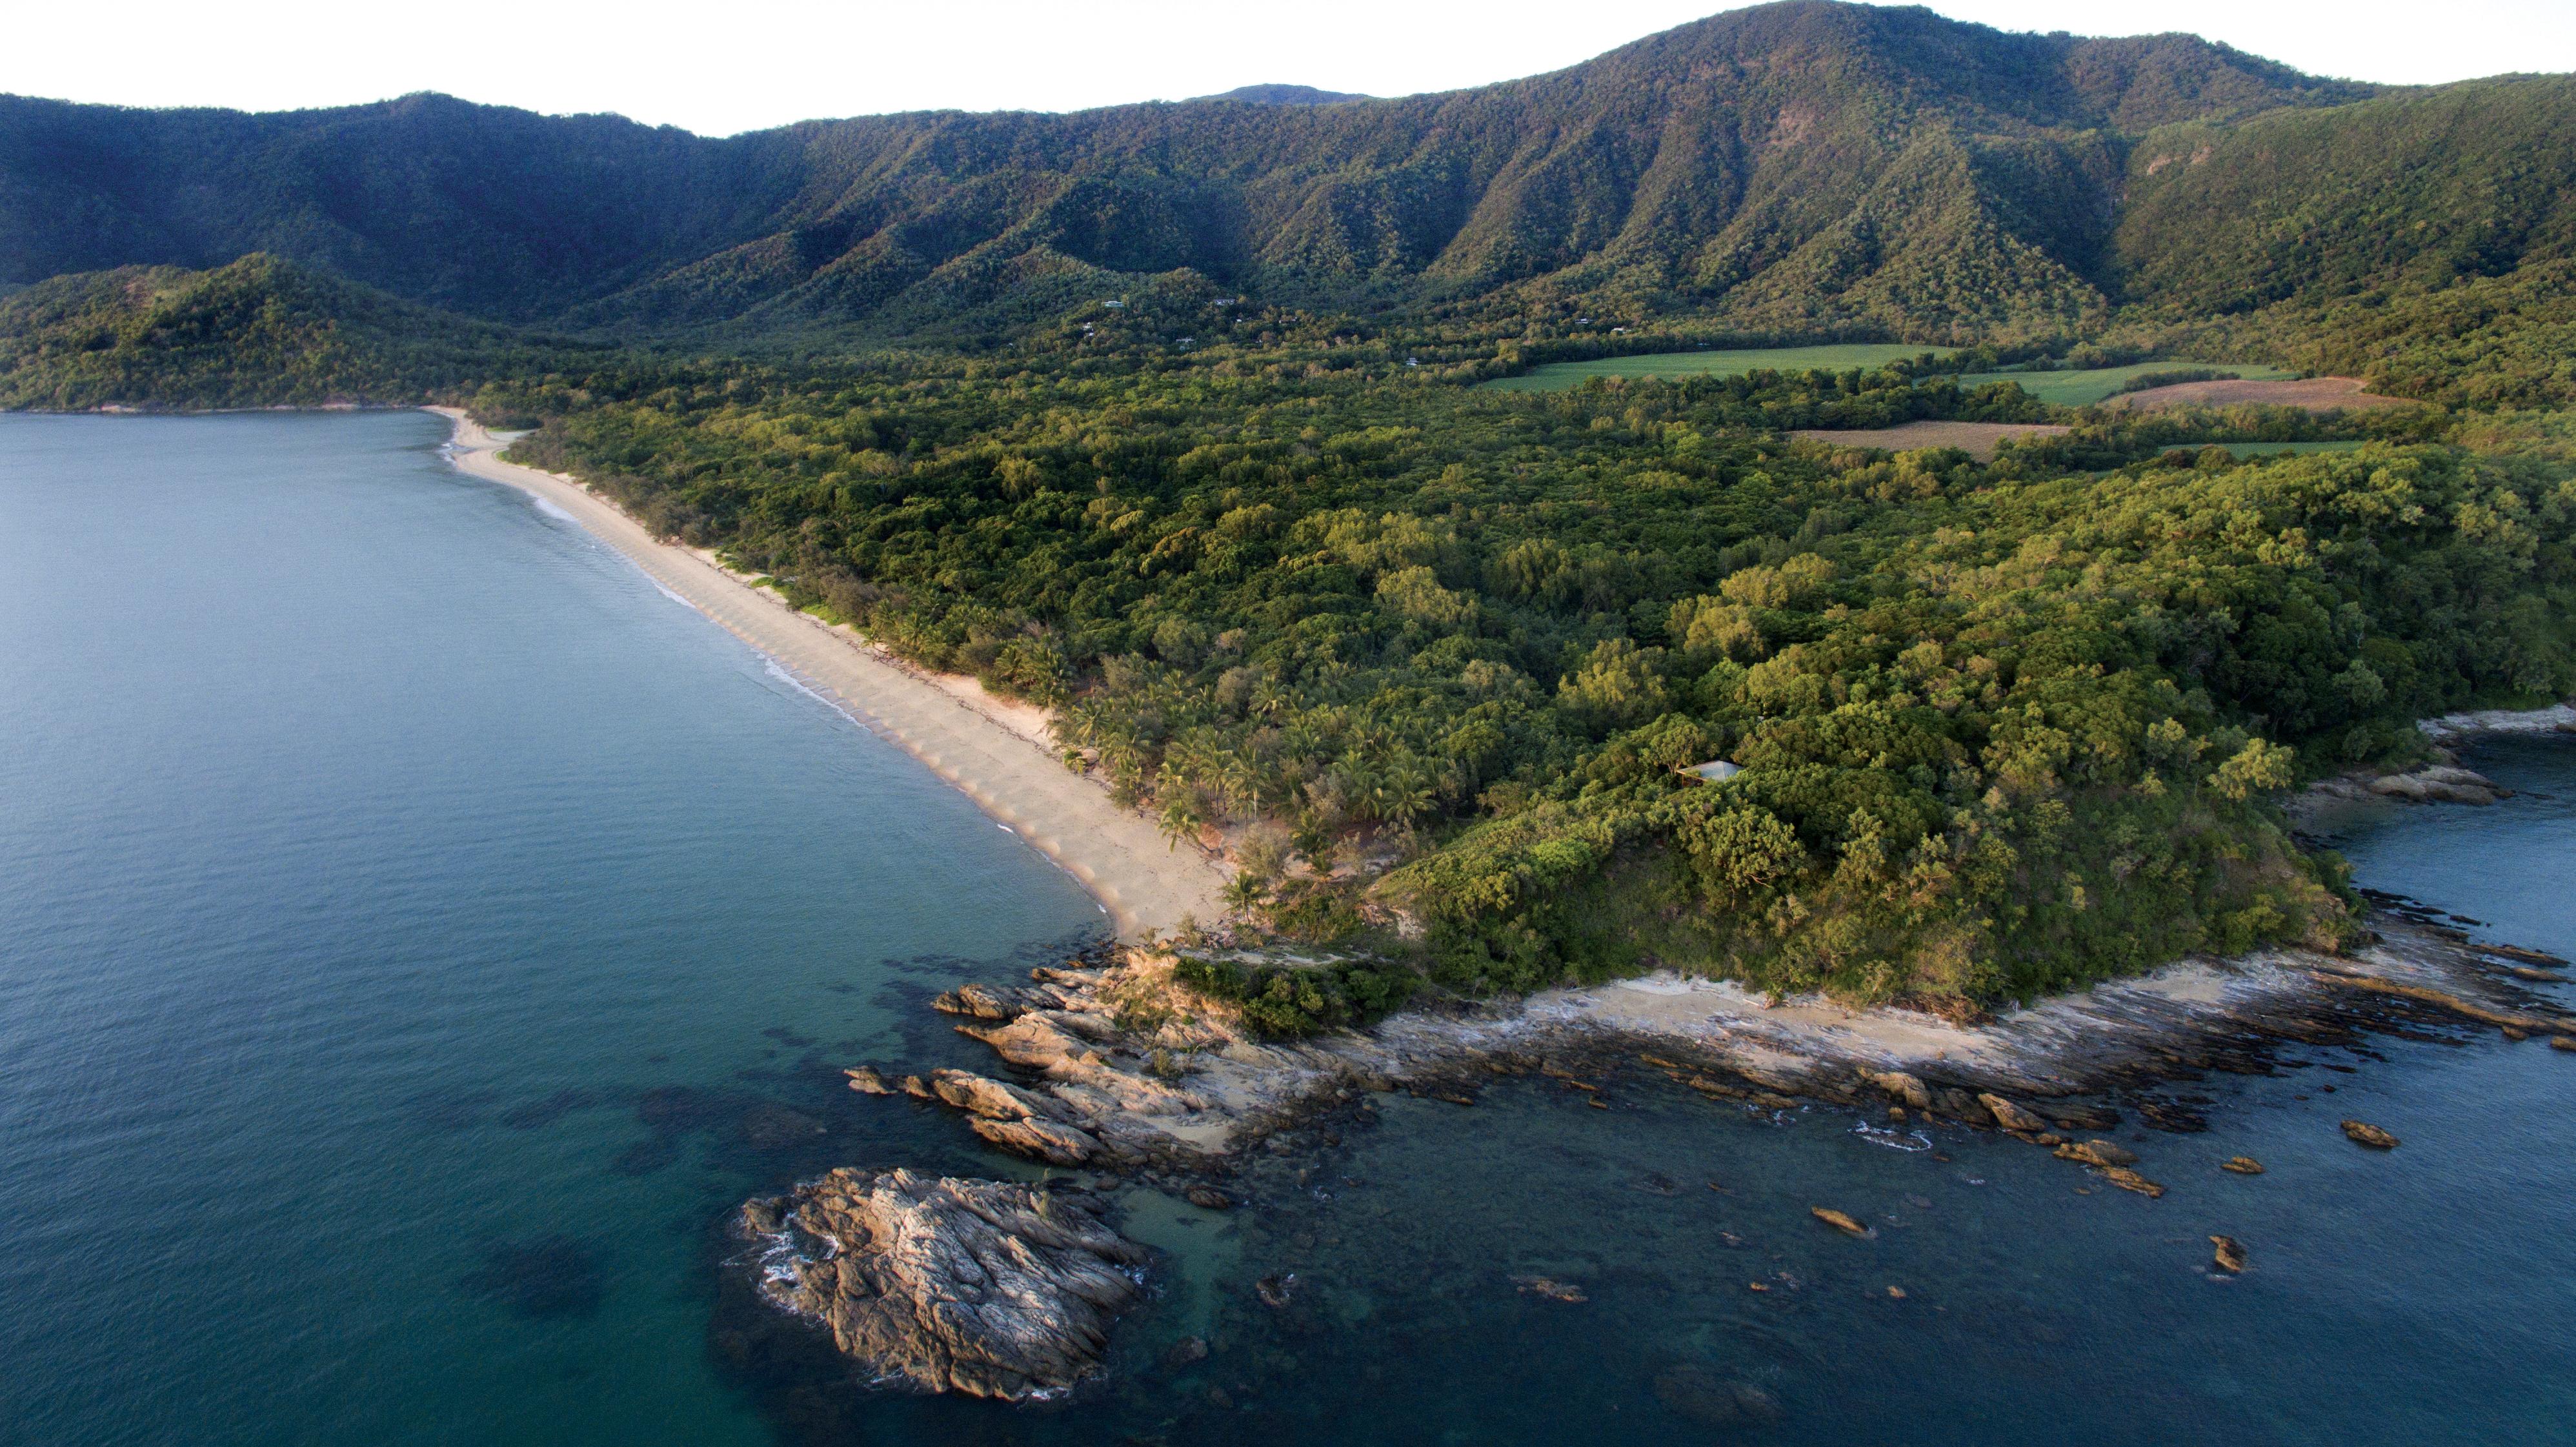 http://www.thalabeach.com.au/wp-content/uploads/2010/07/Thala_Beach_Nature_Reserve_2016__172.jpg